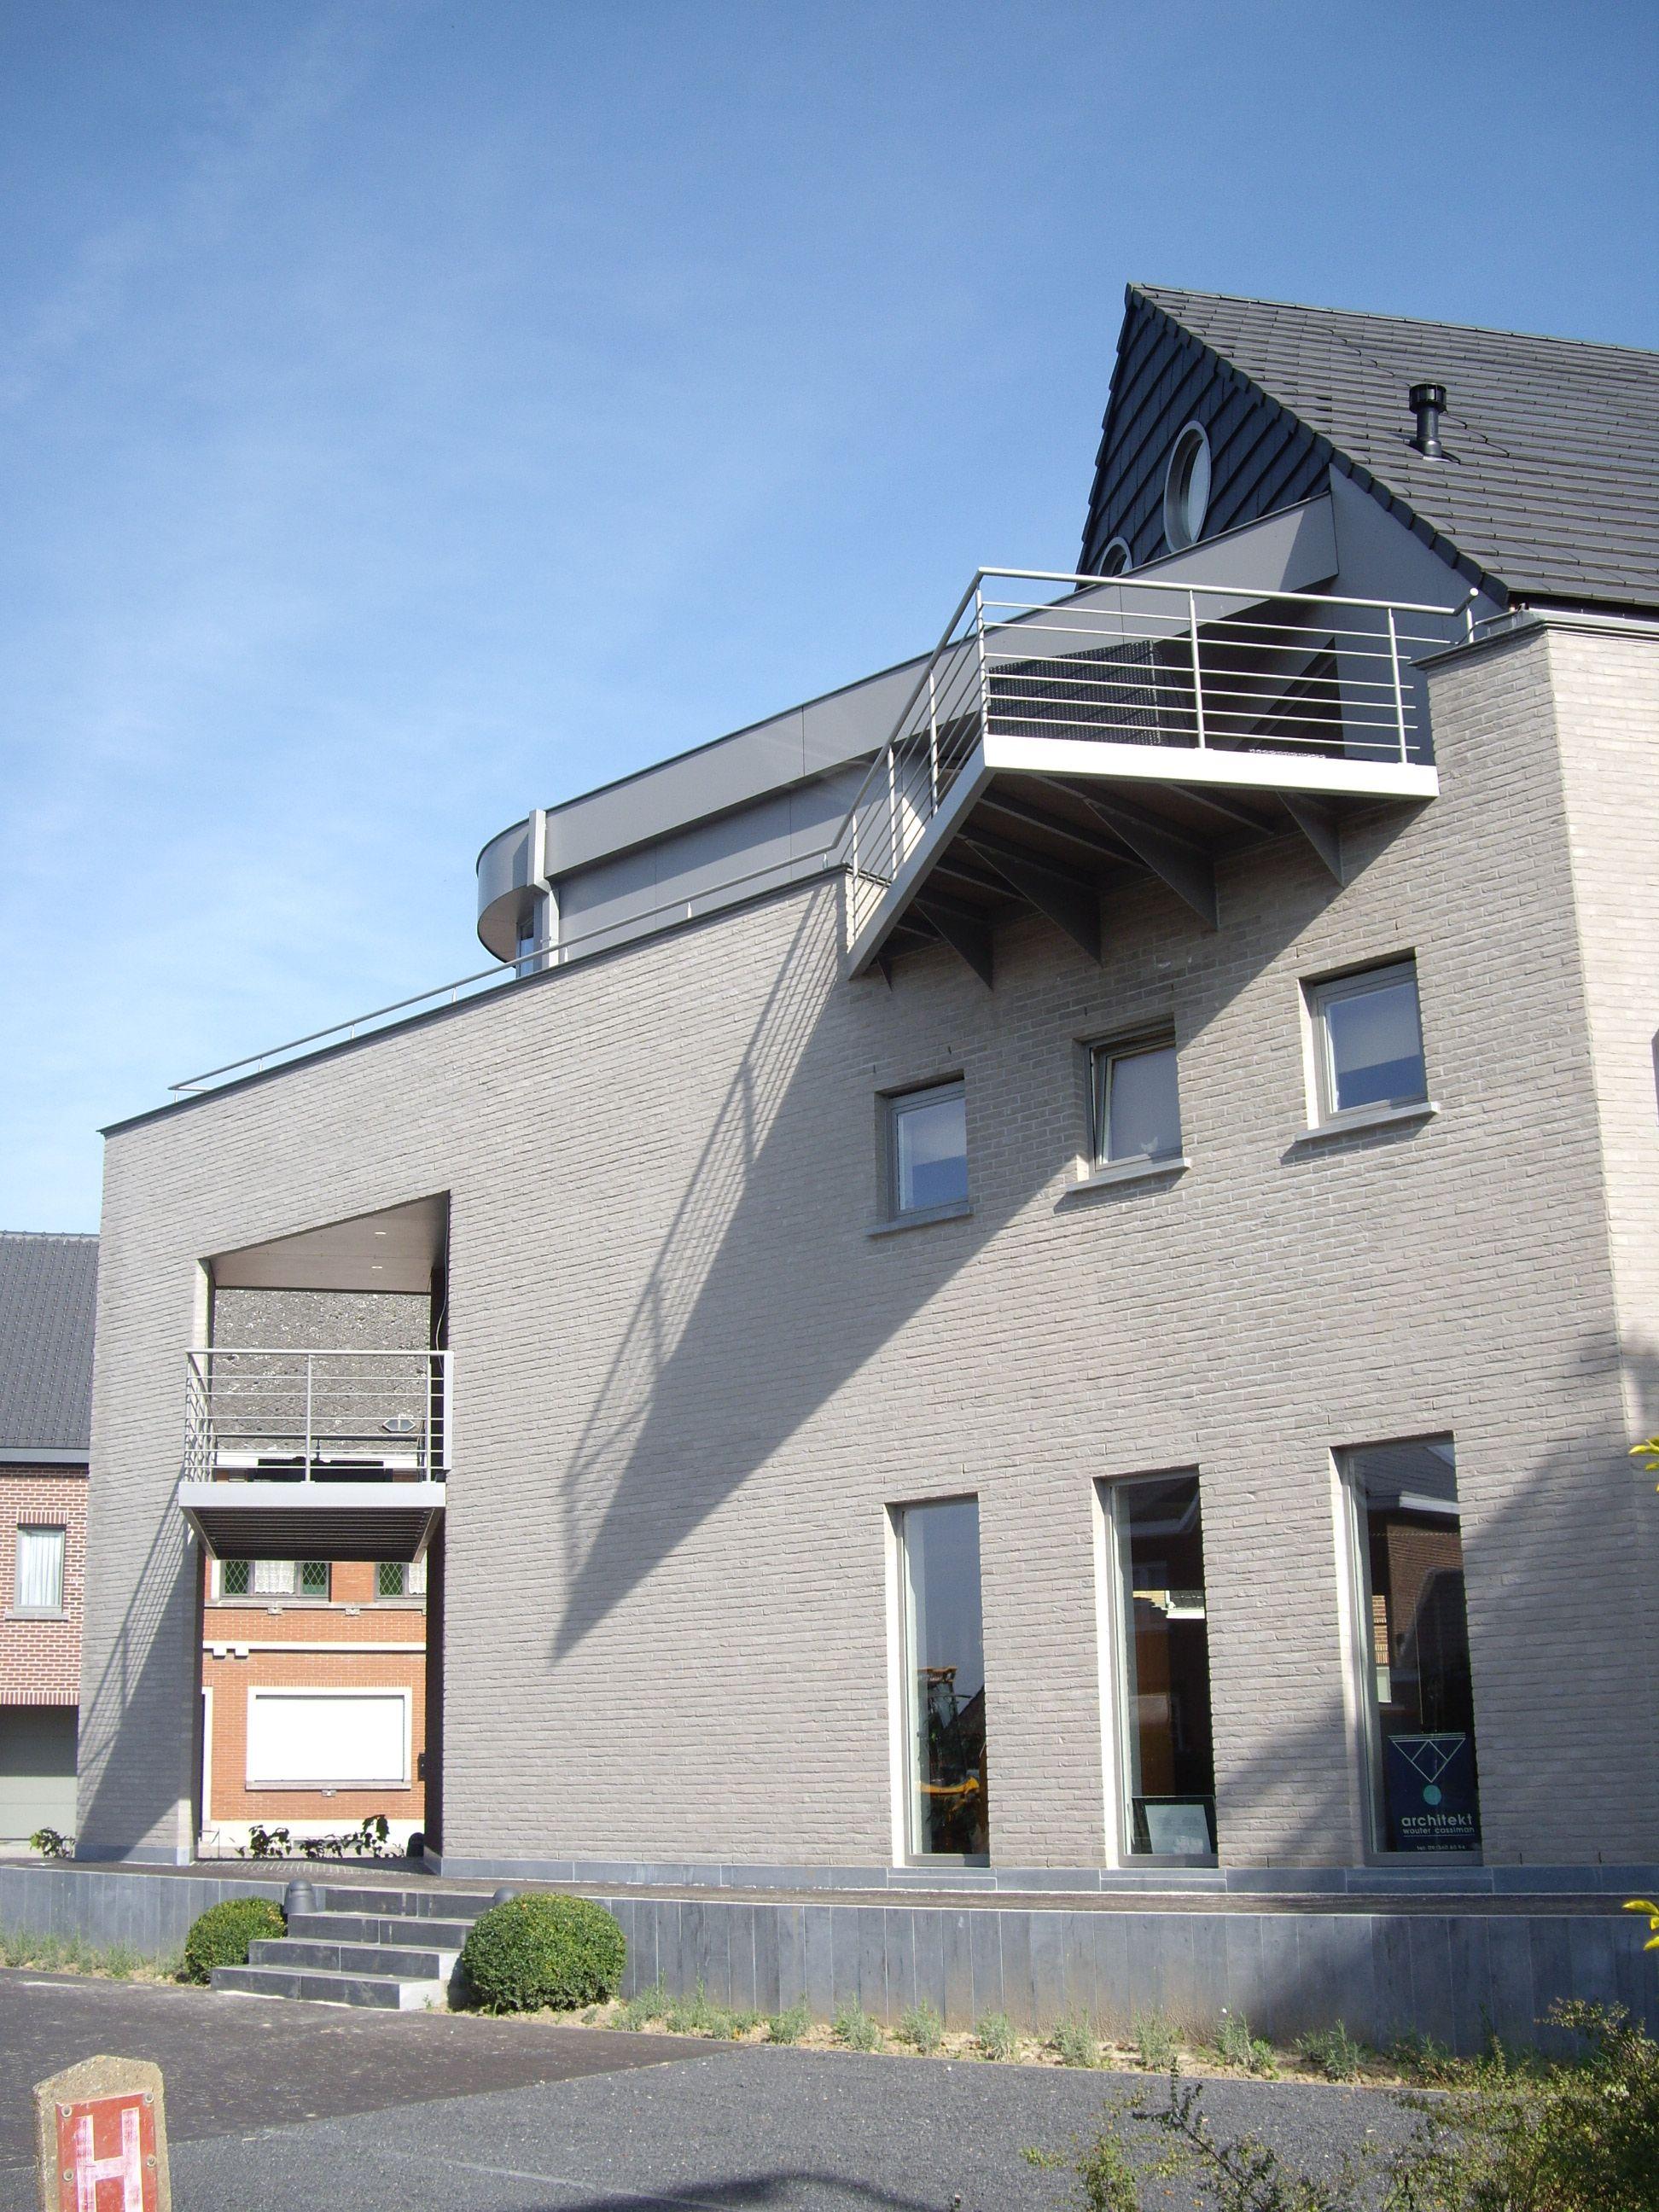 Appartementen en kantoor zottegem architect wouter for Kantoor architect